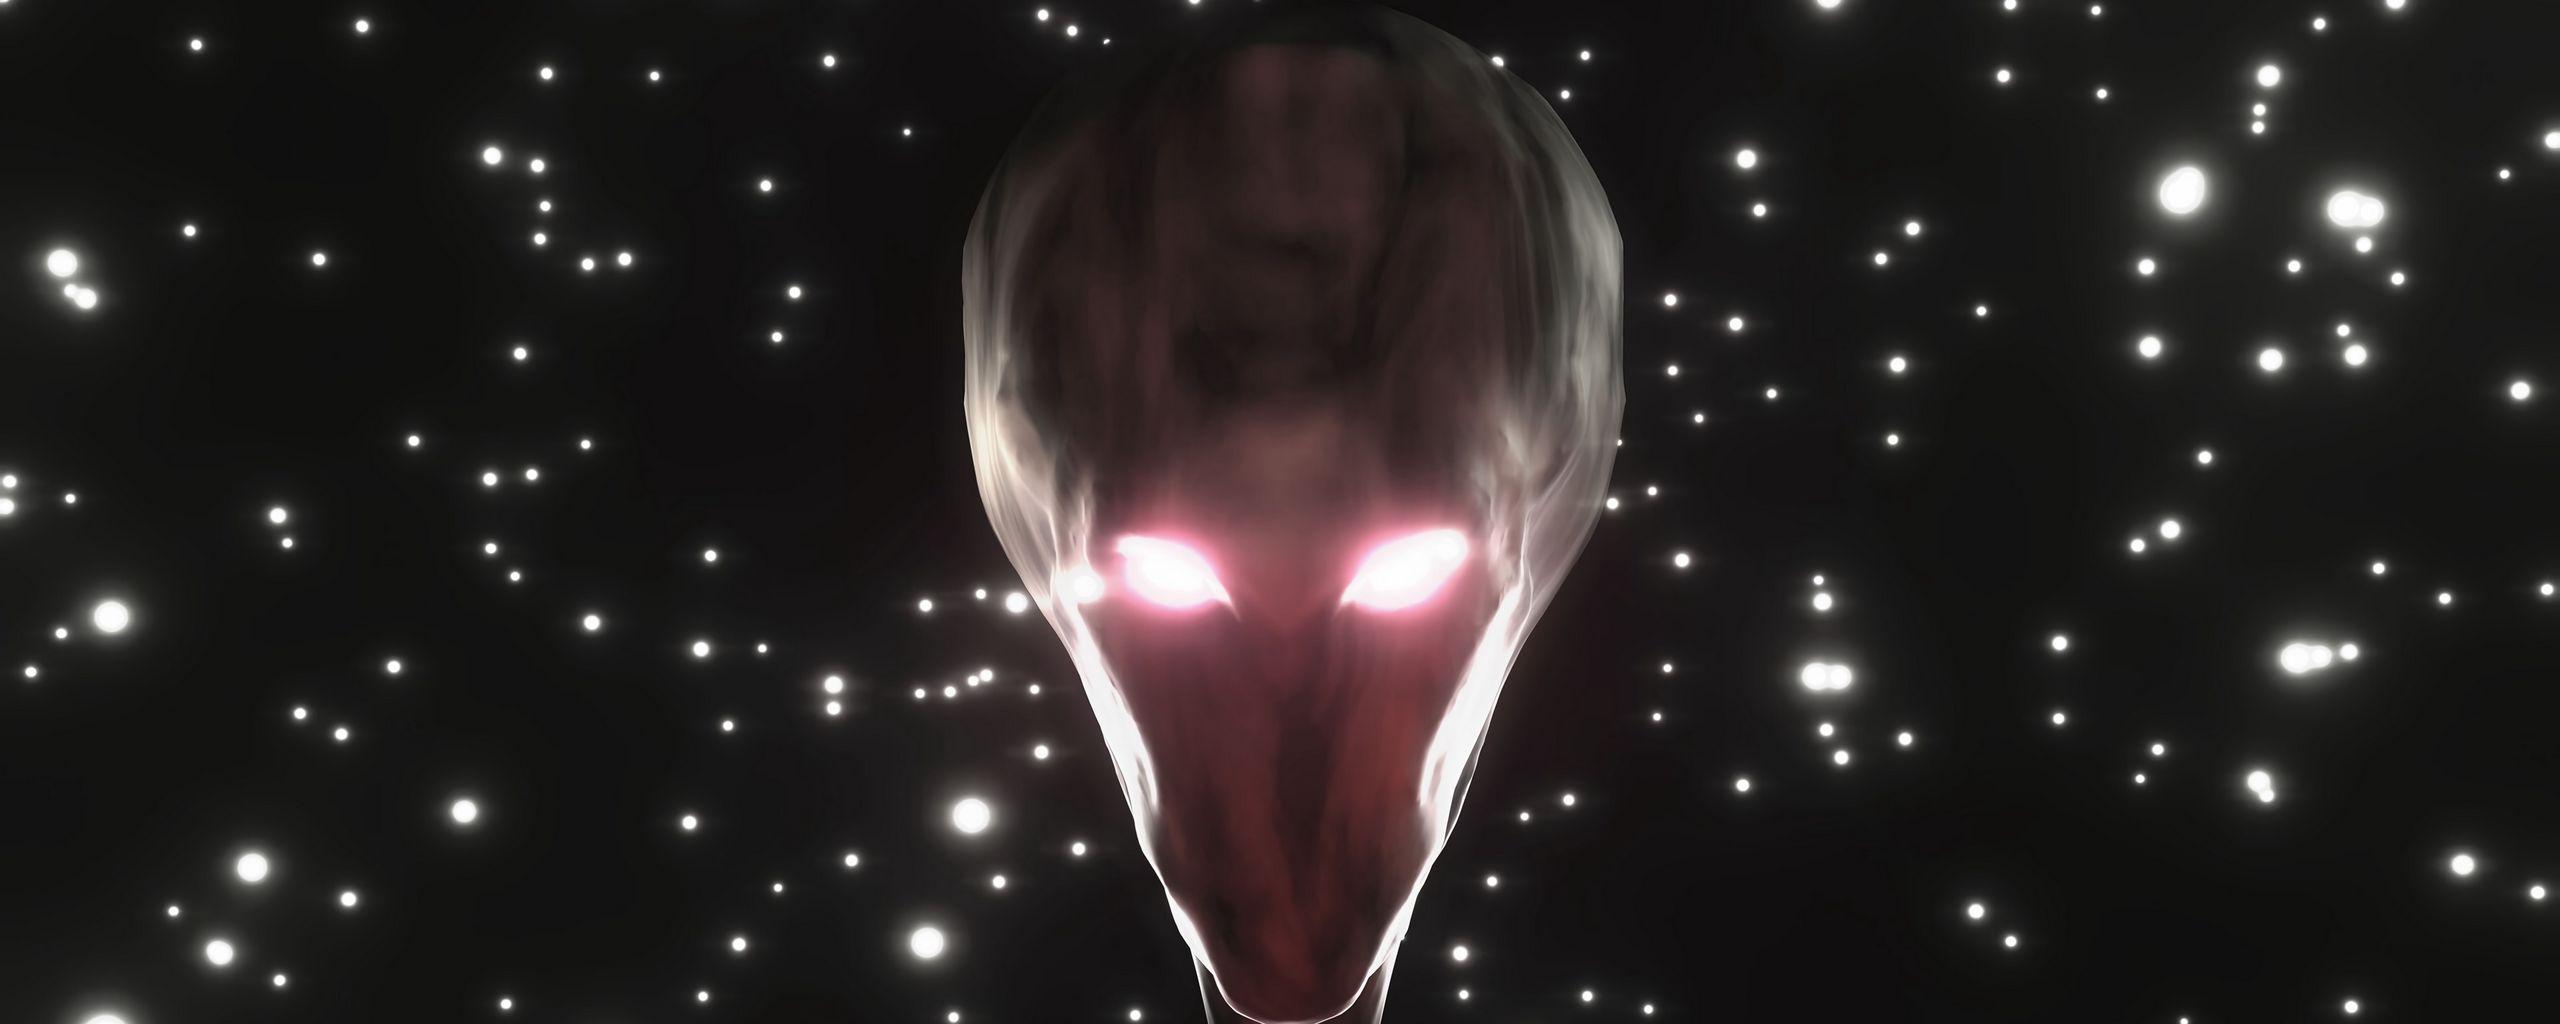 2560x1024 Wallpaper alien, humanoid, face, glow, stars